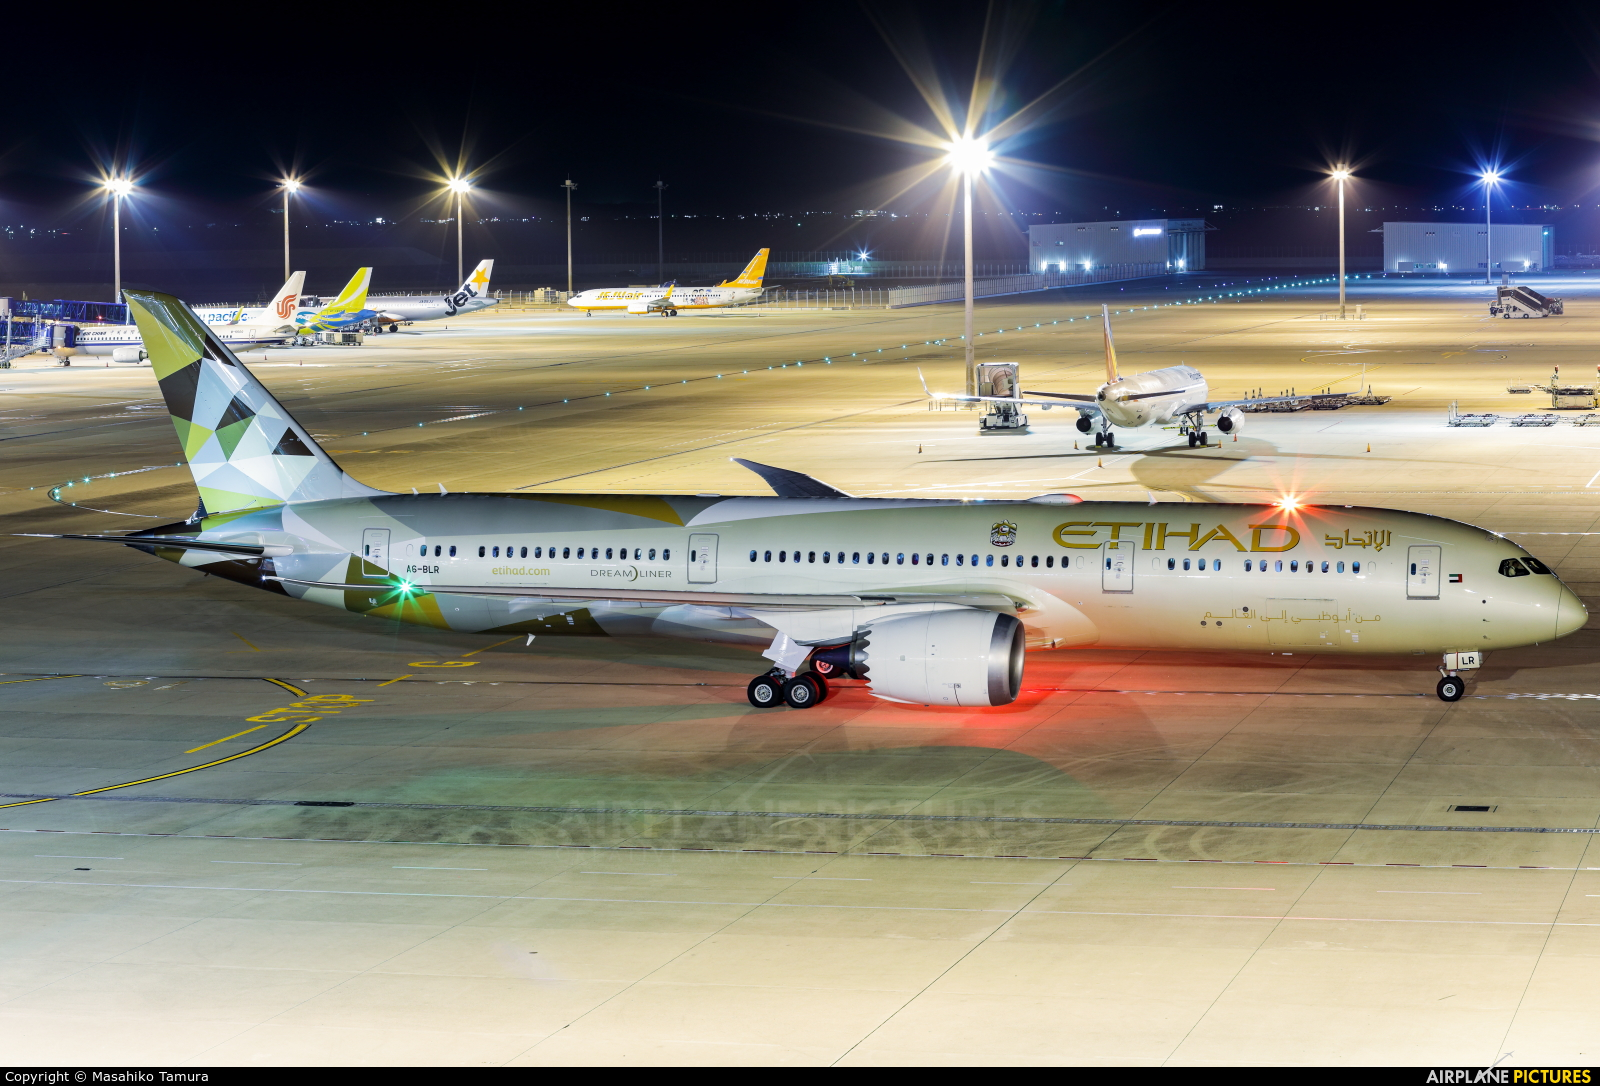 Etihad Airways A6-BLR aircraft at Chubu Centrair Intl